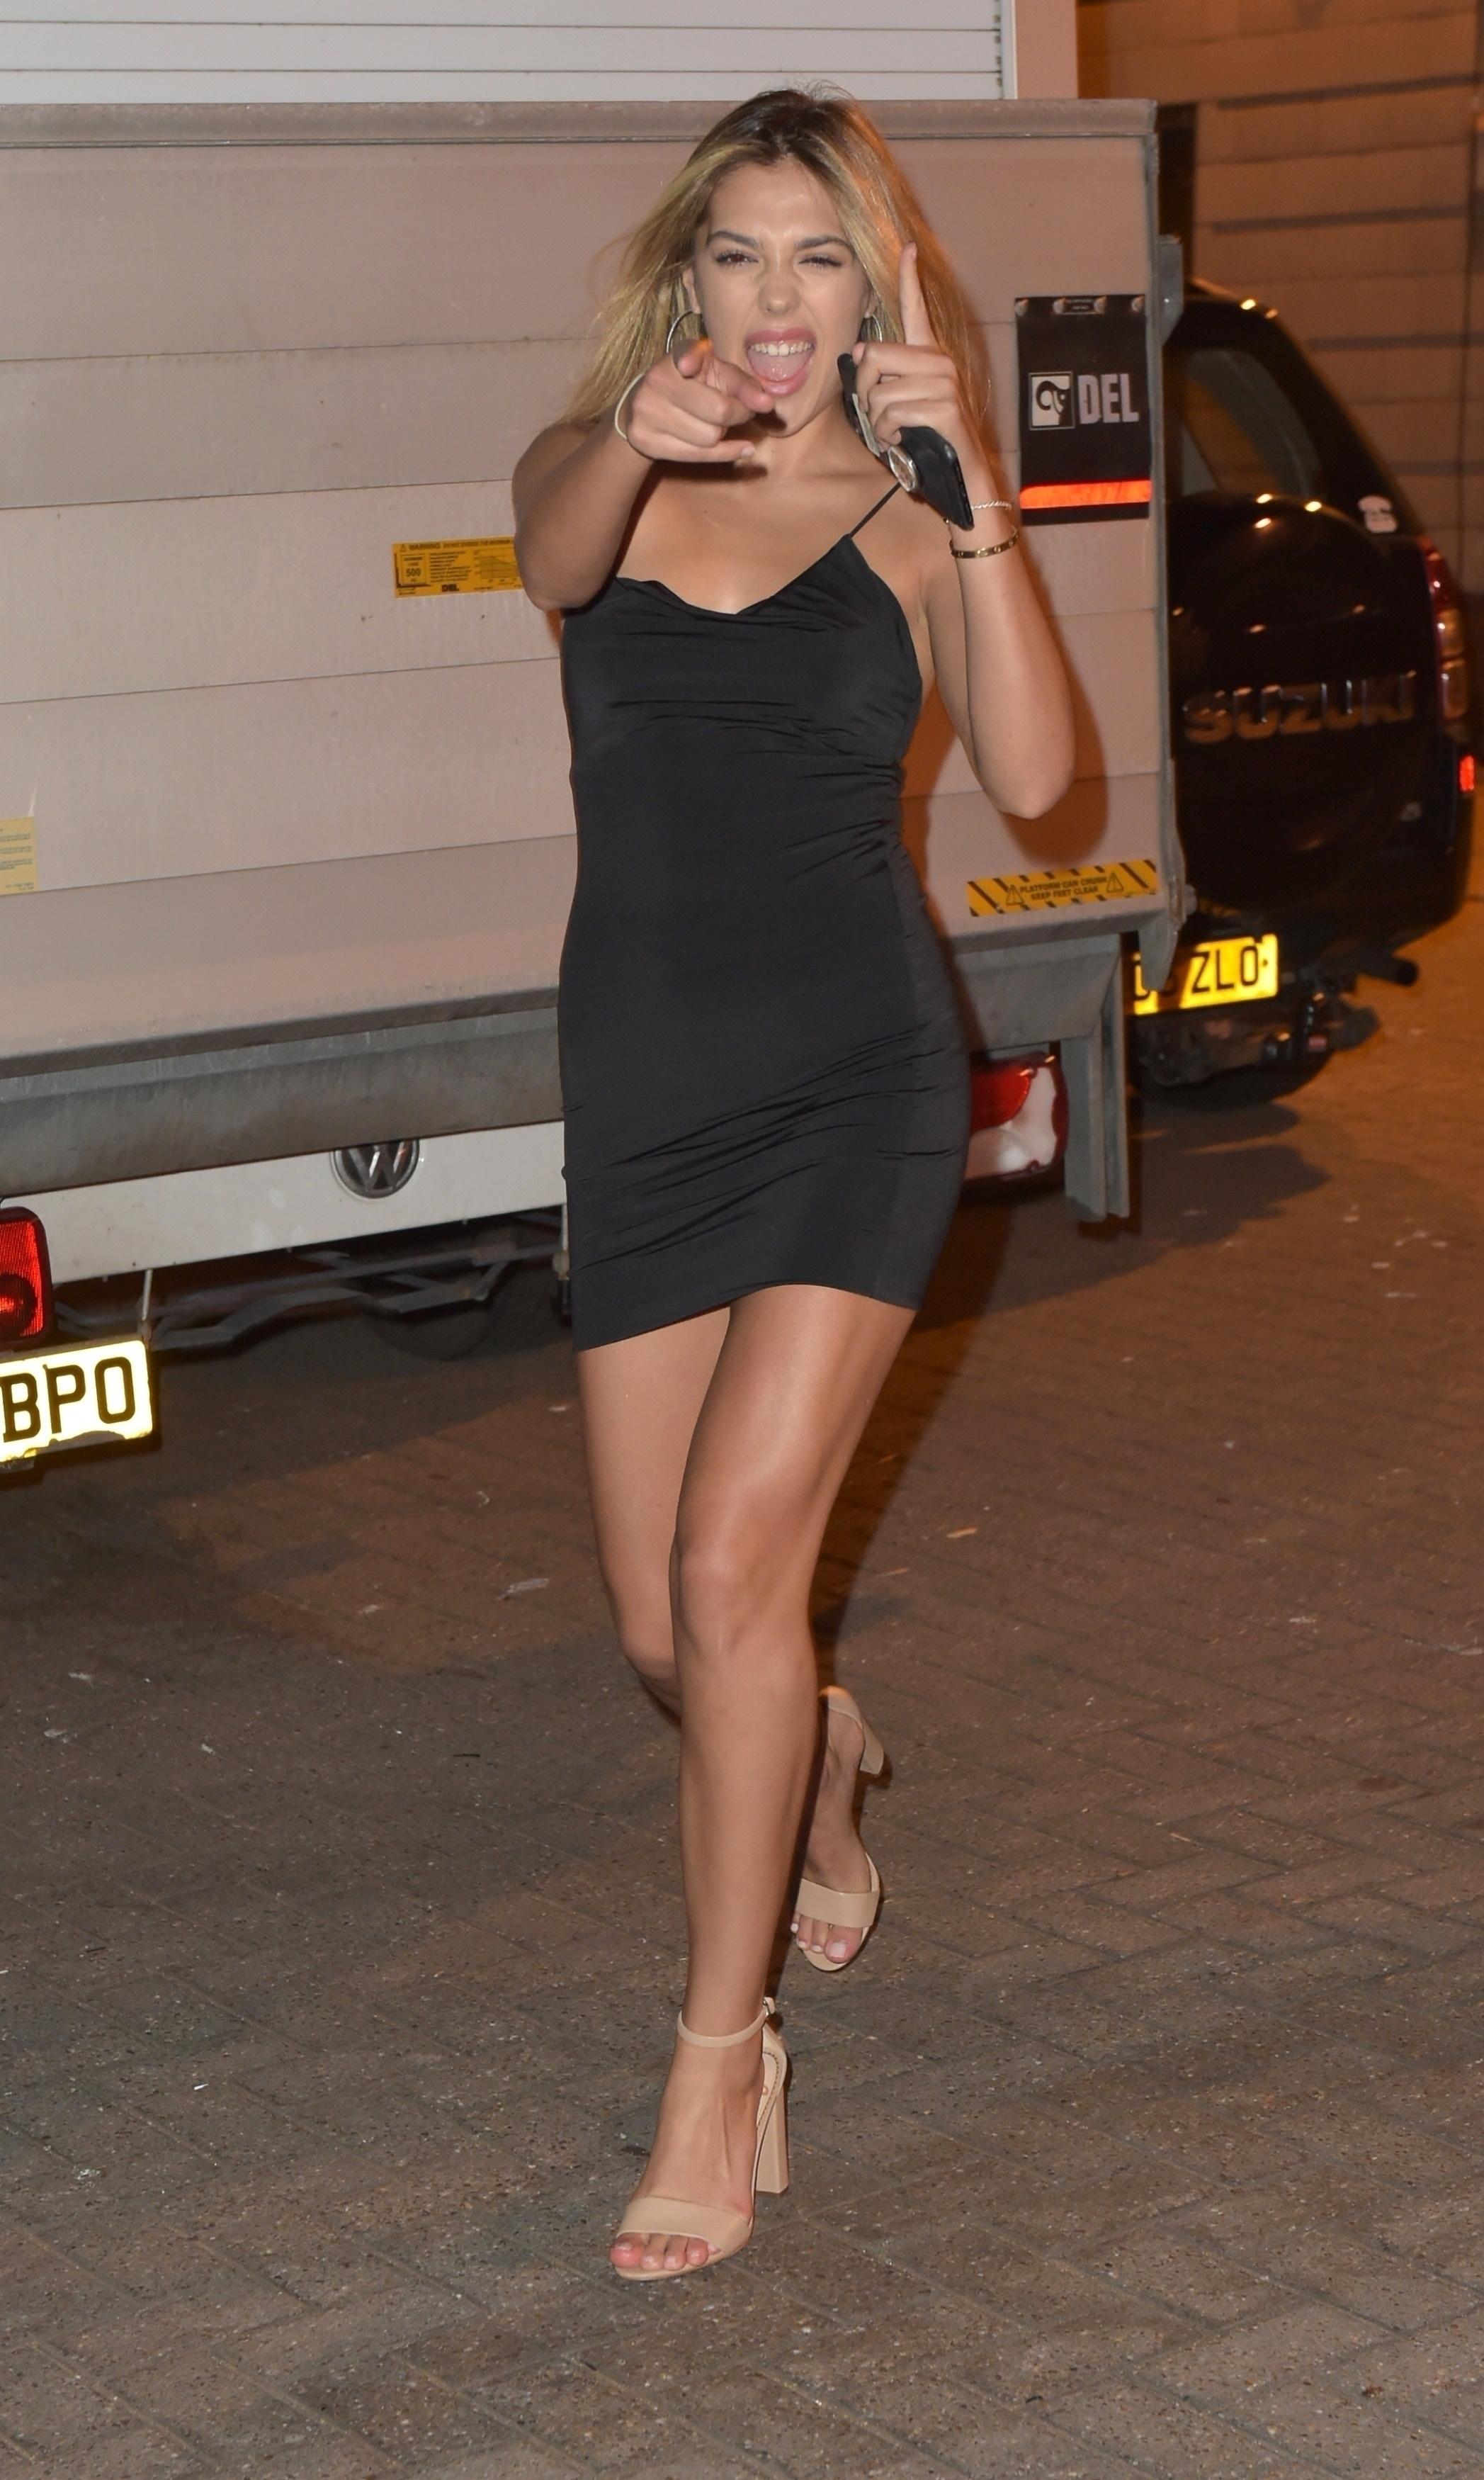 Feet Sistine Stallone nudes (26 photo), Topless, Leaked, Boobs, underwear 2015